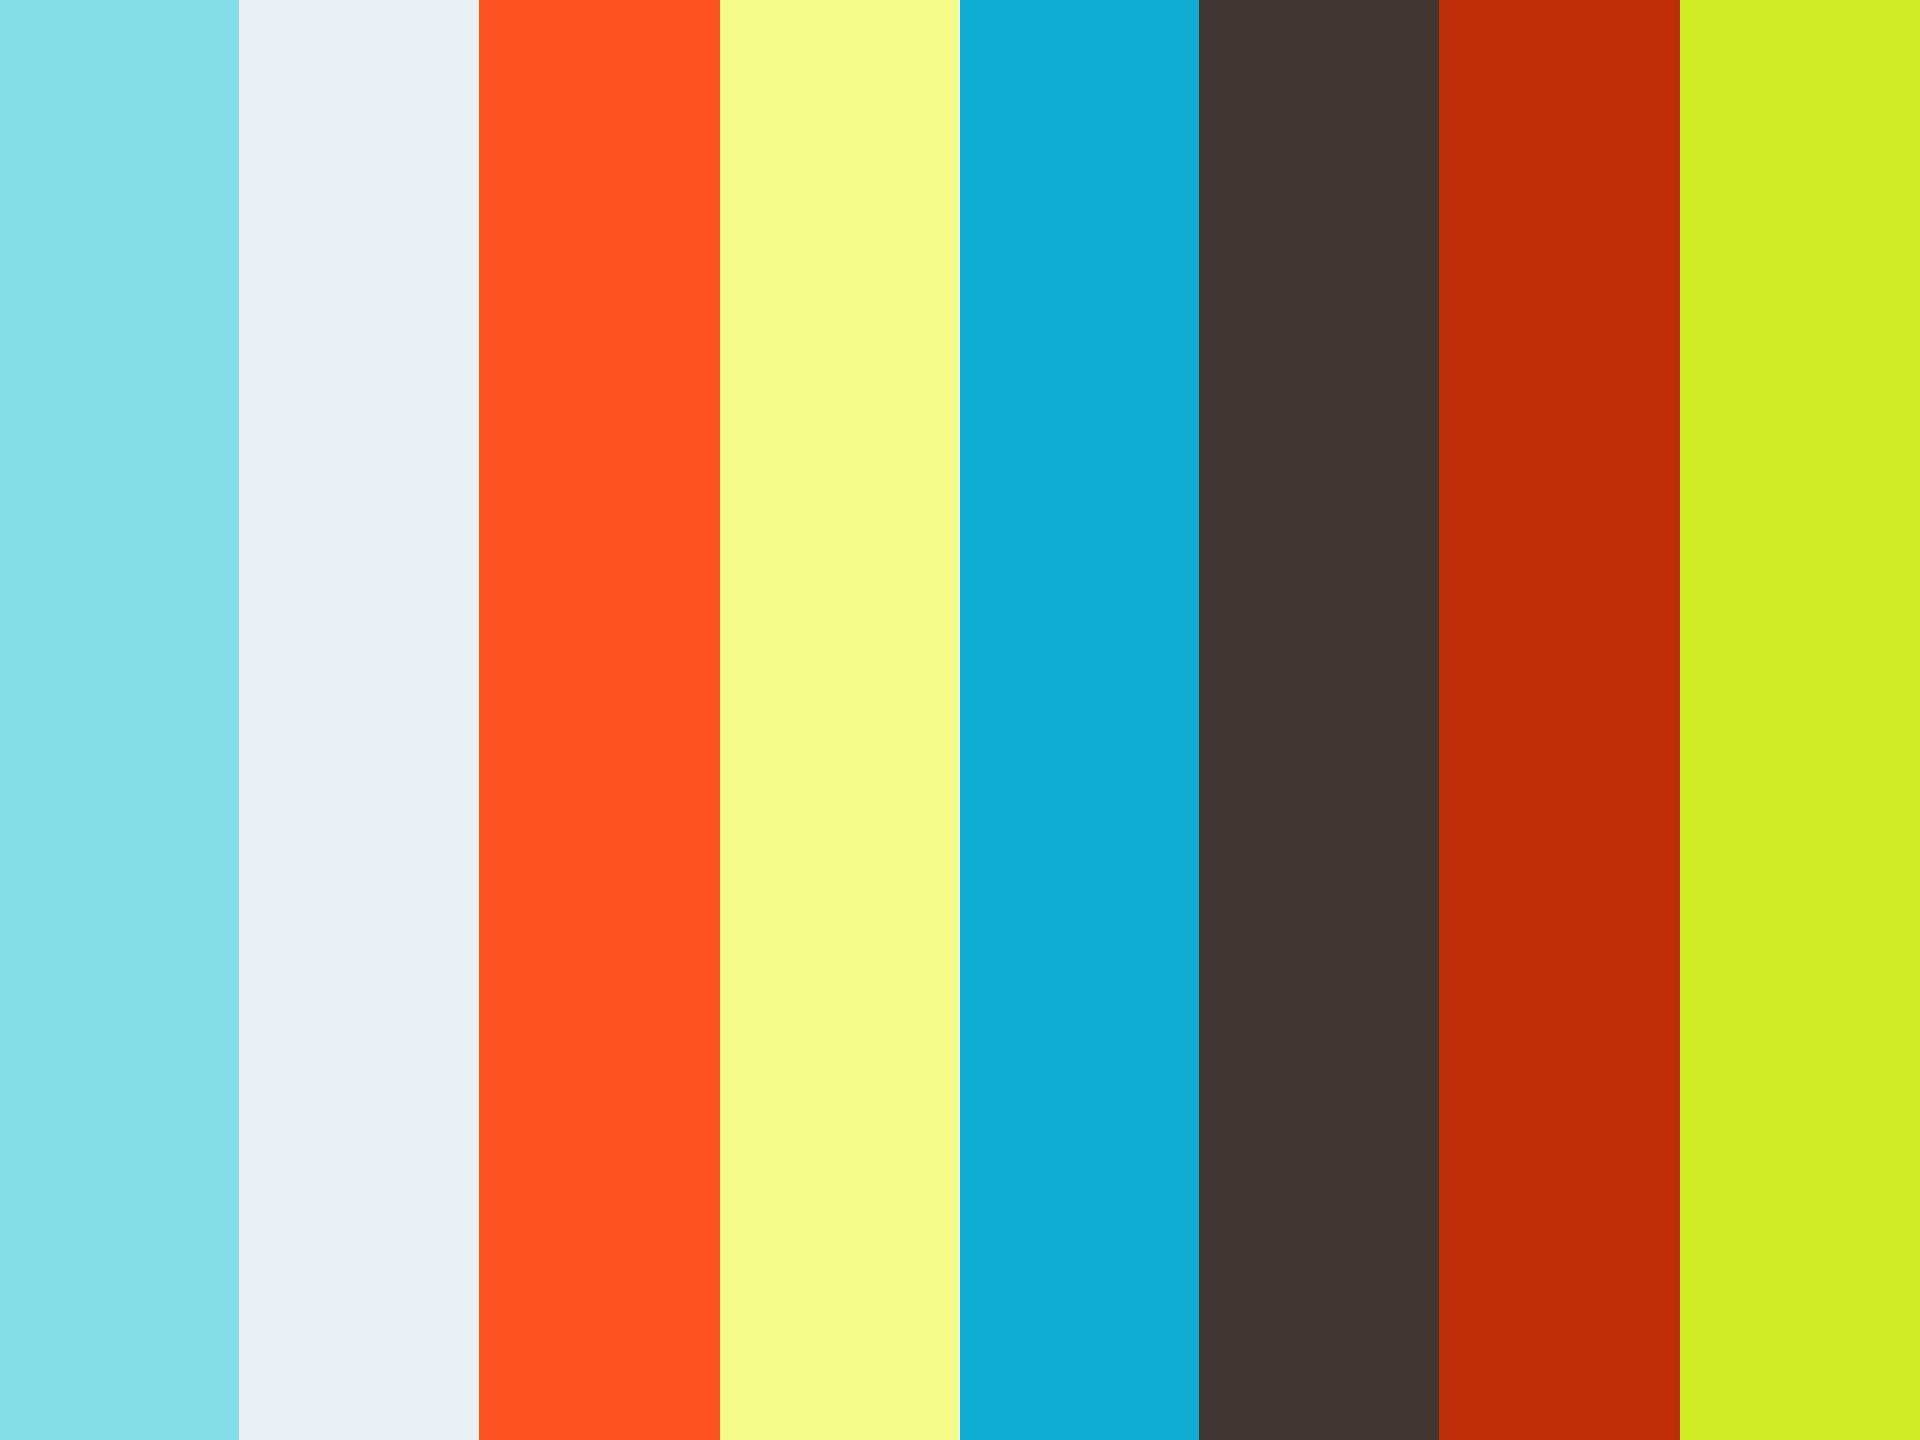 Blender 3d Wallpaper Laniakea Cosmography Visualization On Vimeo